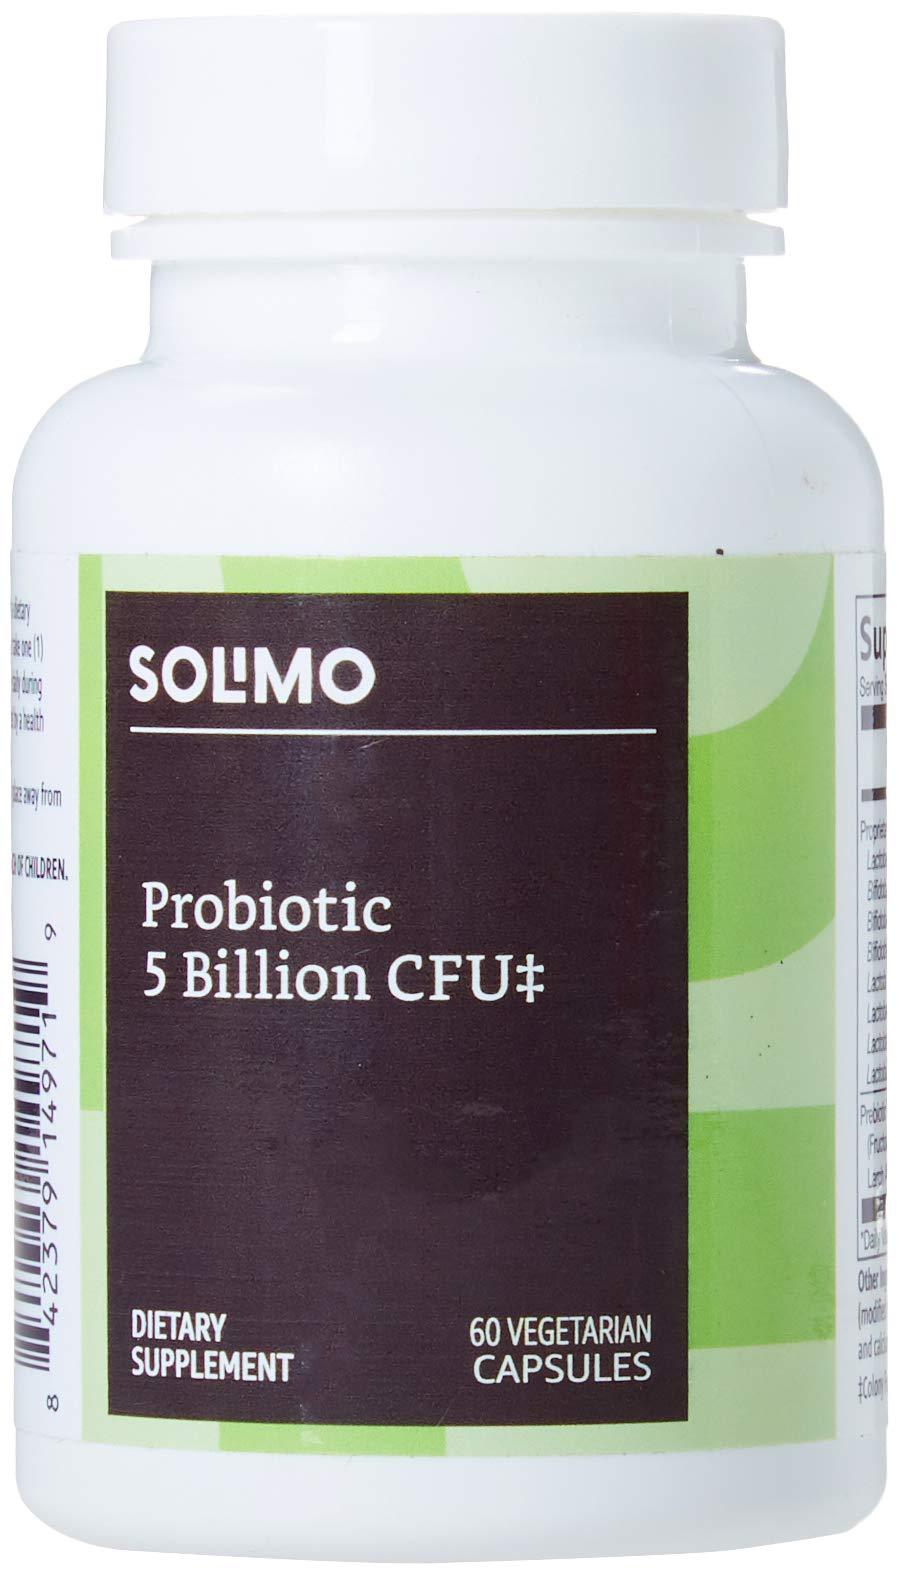 Amazon Brand - Solimo Probiotic 5 Billion CFU, 8 Probiotic strains with 60 mg Prebiotic Blend, 60 Vegetarian Capsules, 2 Month Supply